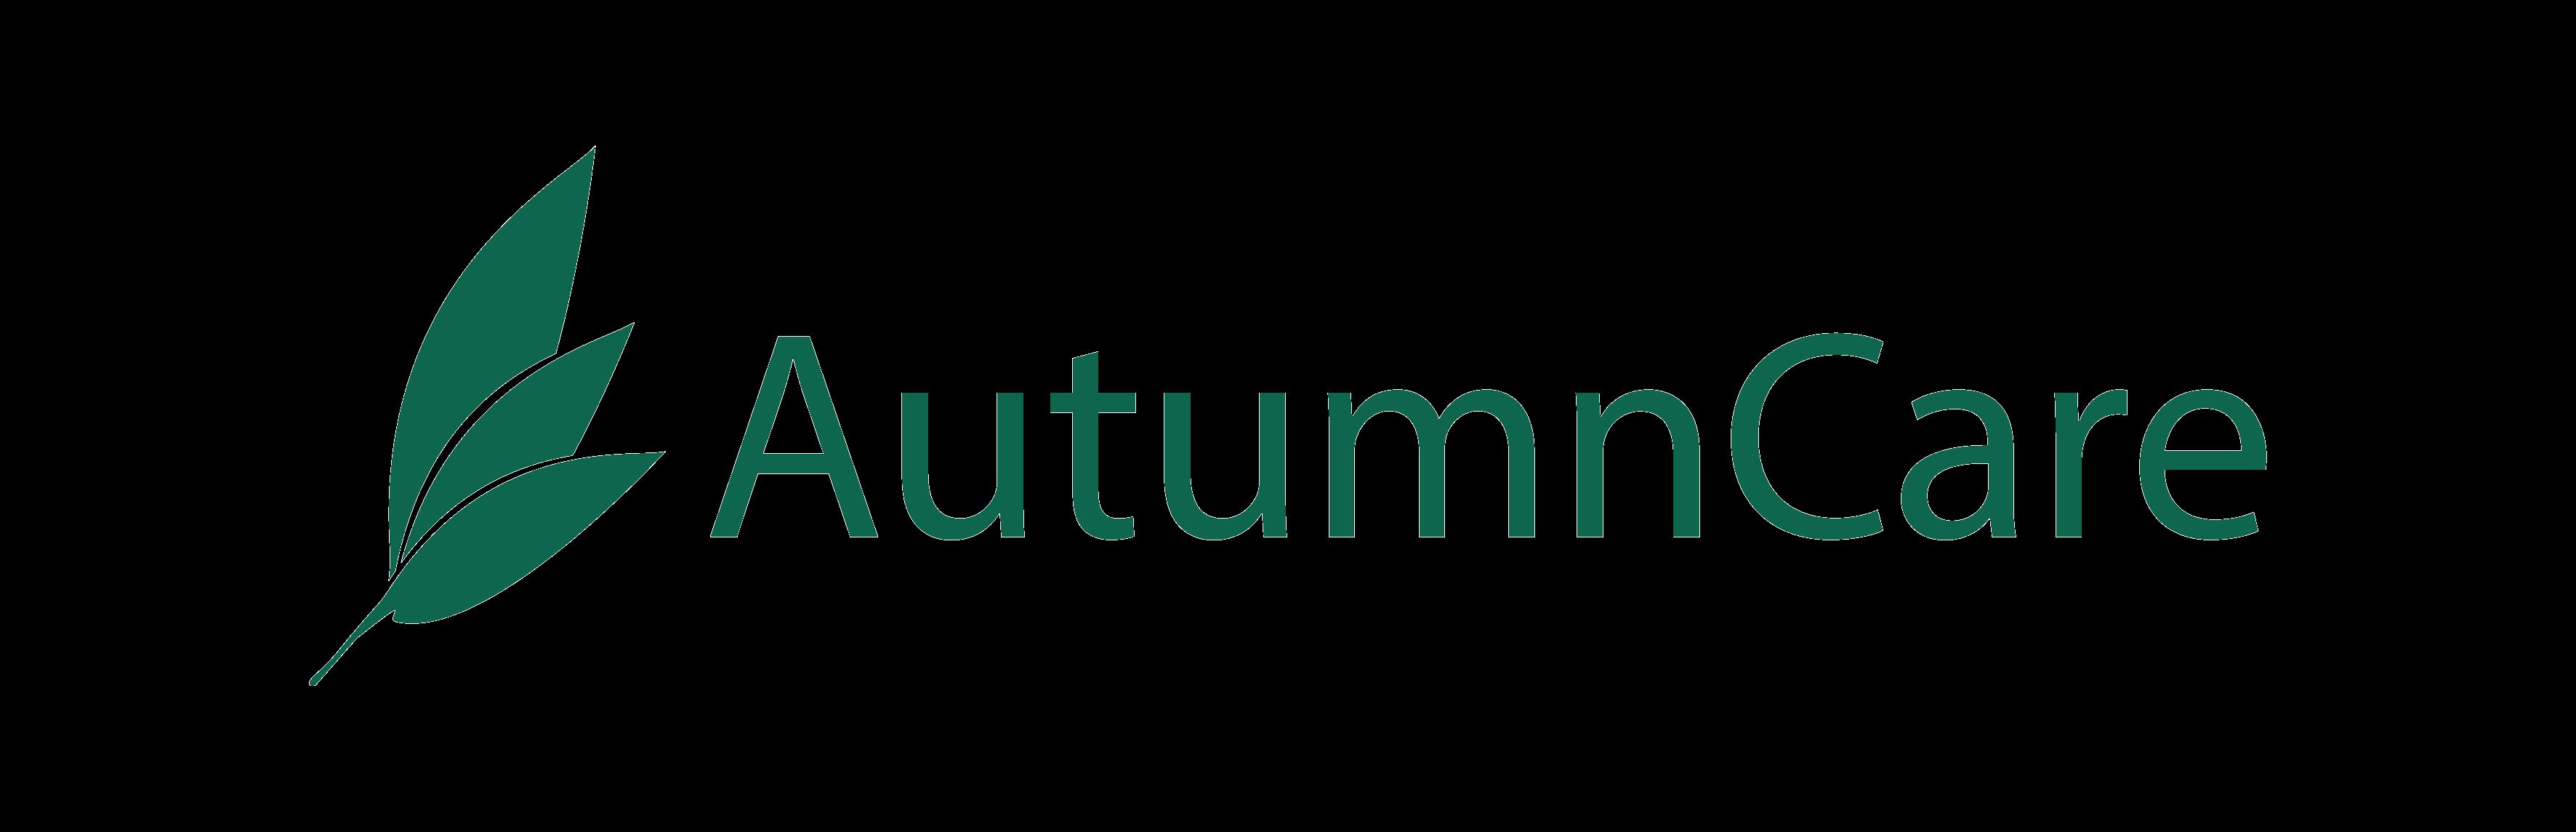 AutumnCare Limited